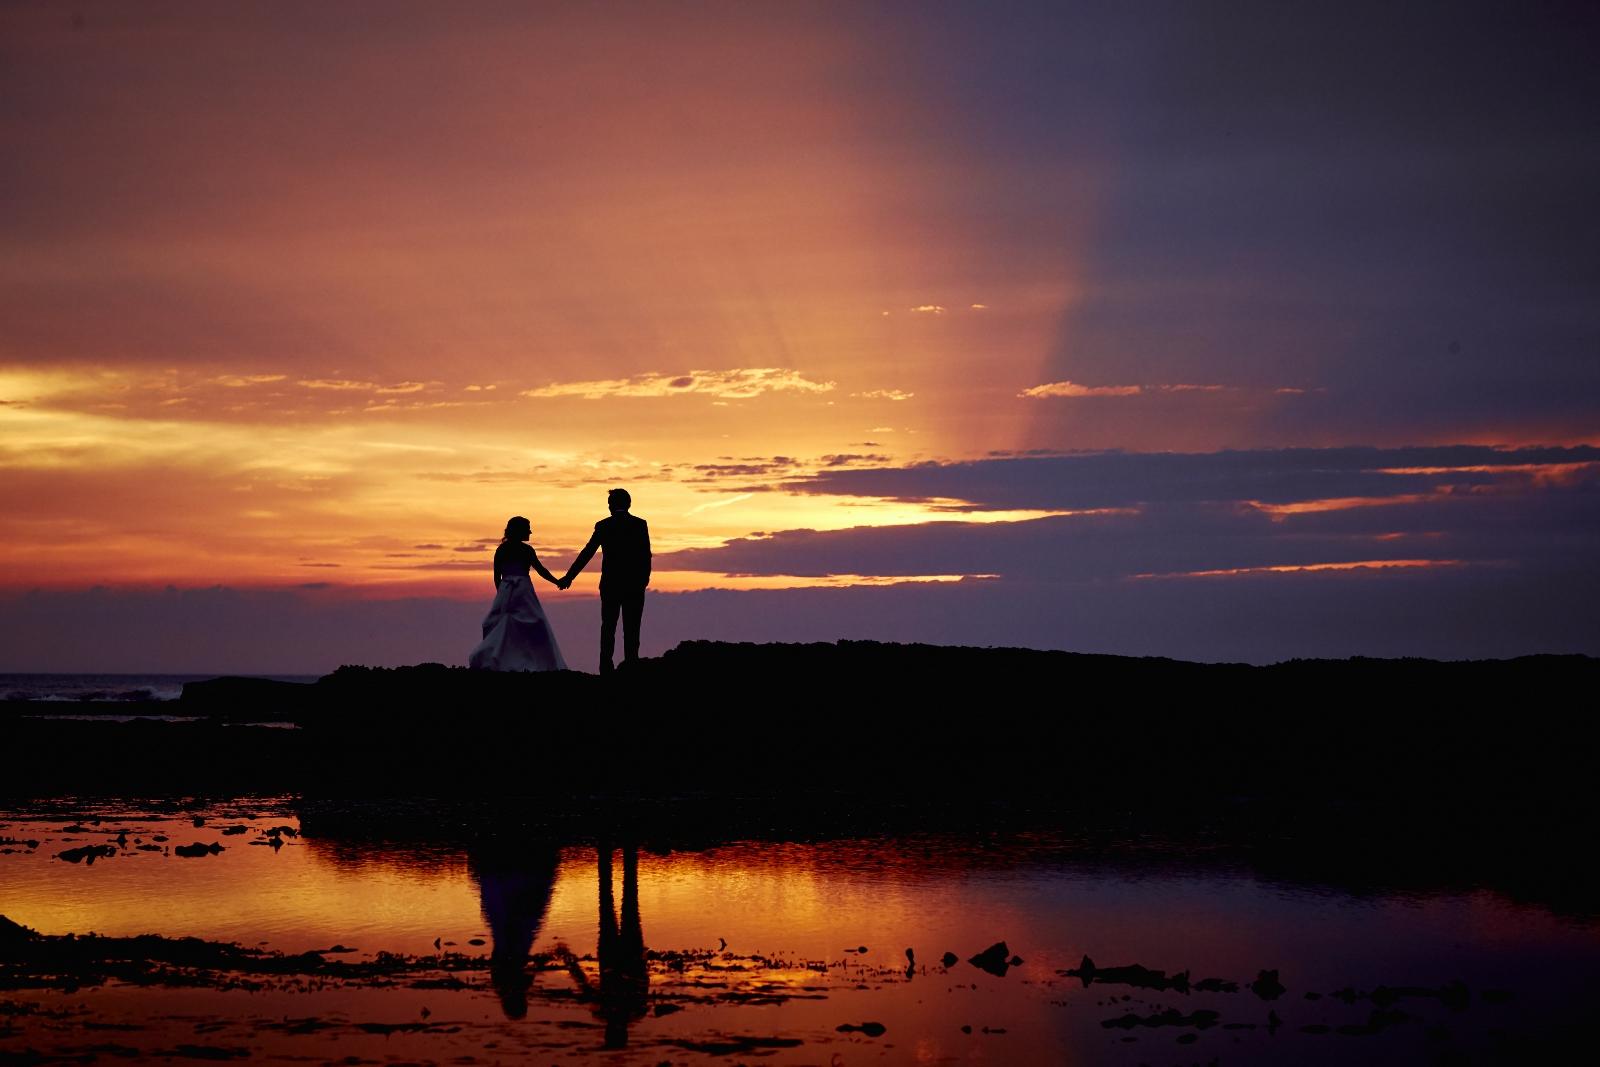 James + Annika: Spring Romance at Radisson Blu Hotel and Spa Limerick